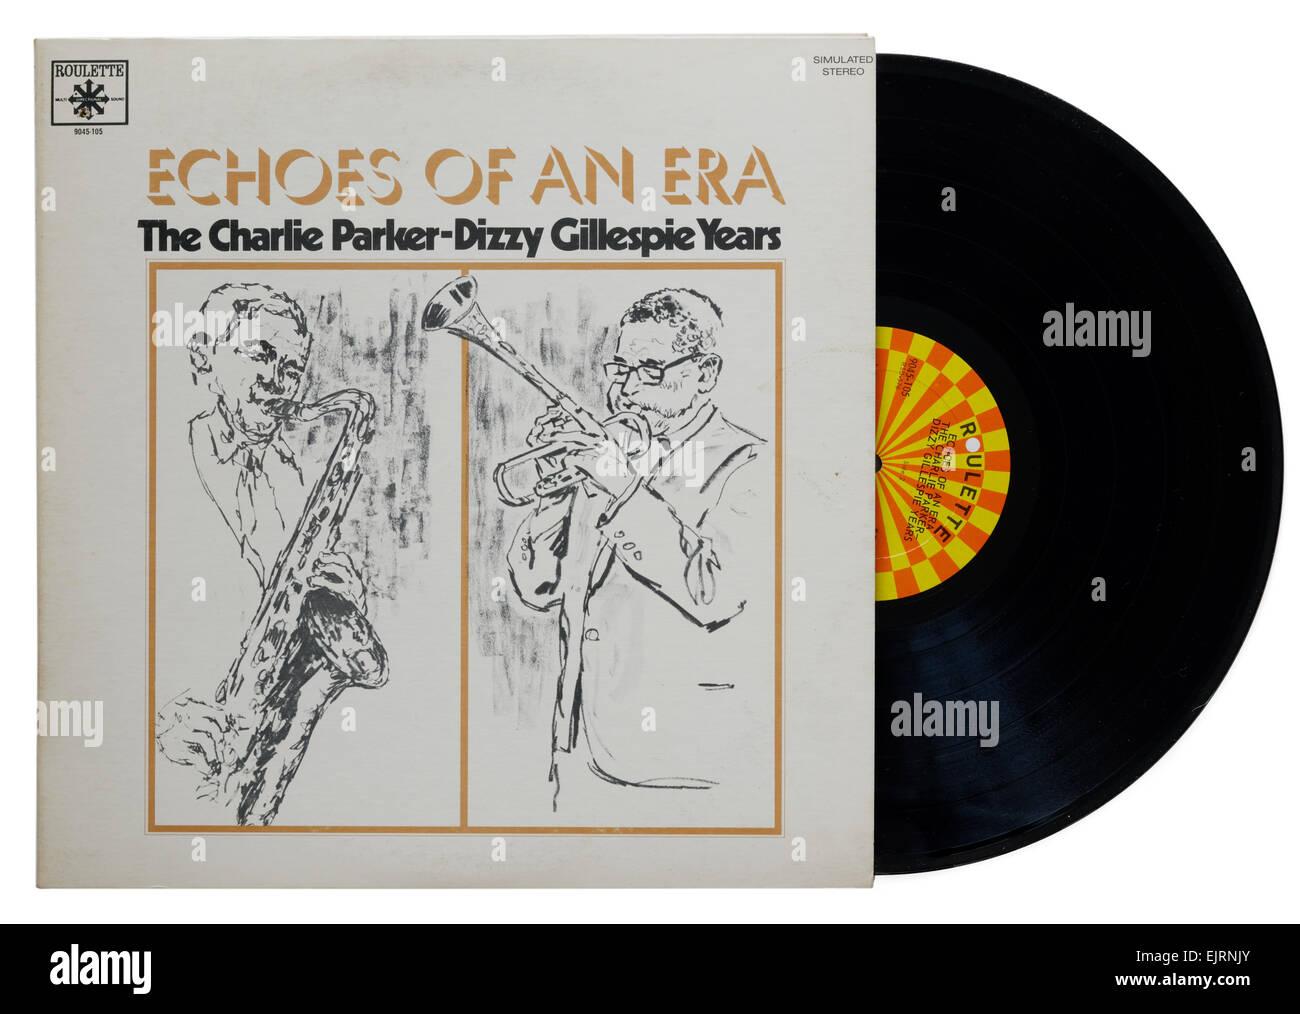 Charlie Parker Dizzy Gillespie jazz album - Stock Image